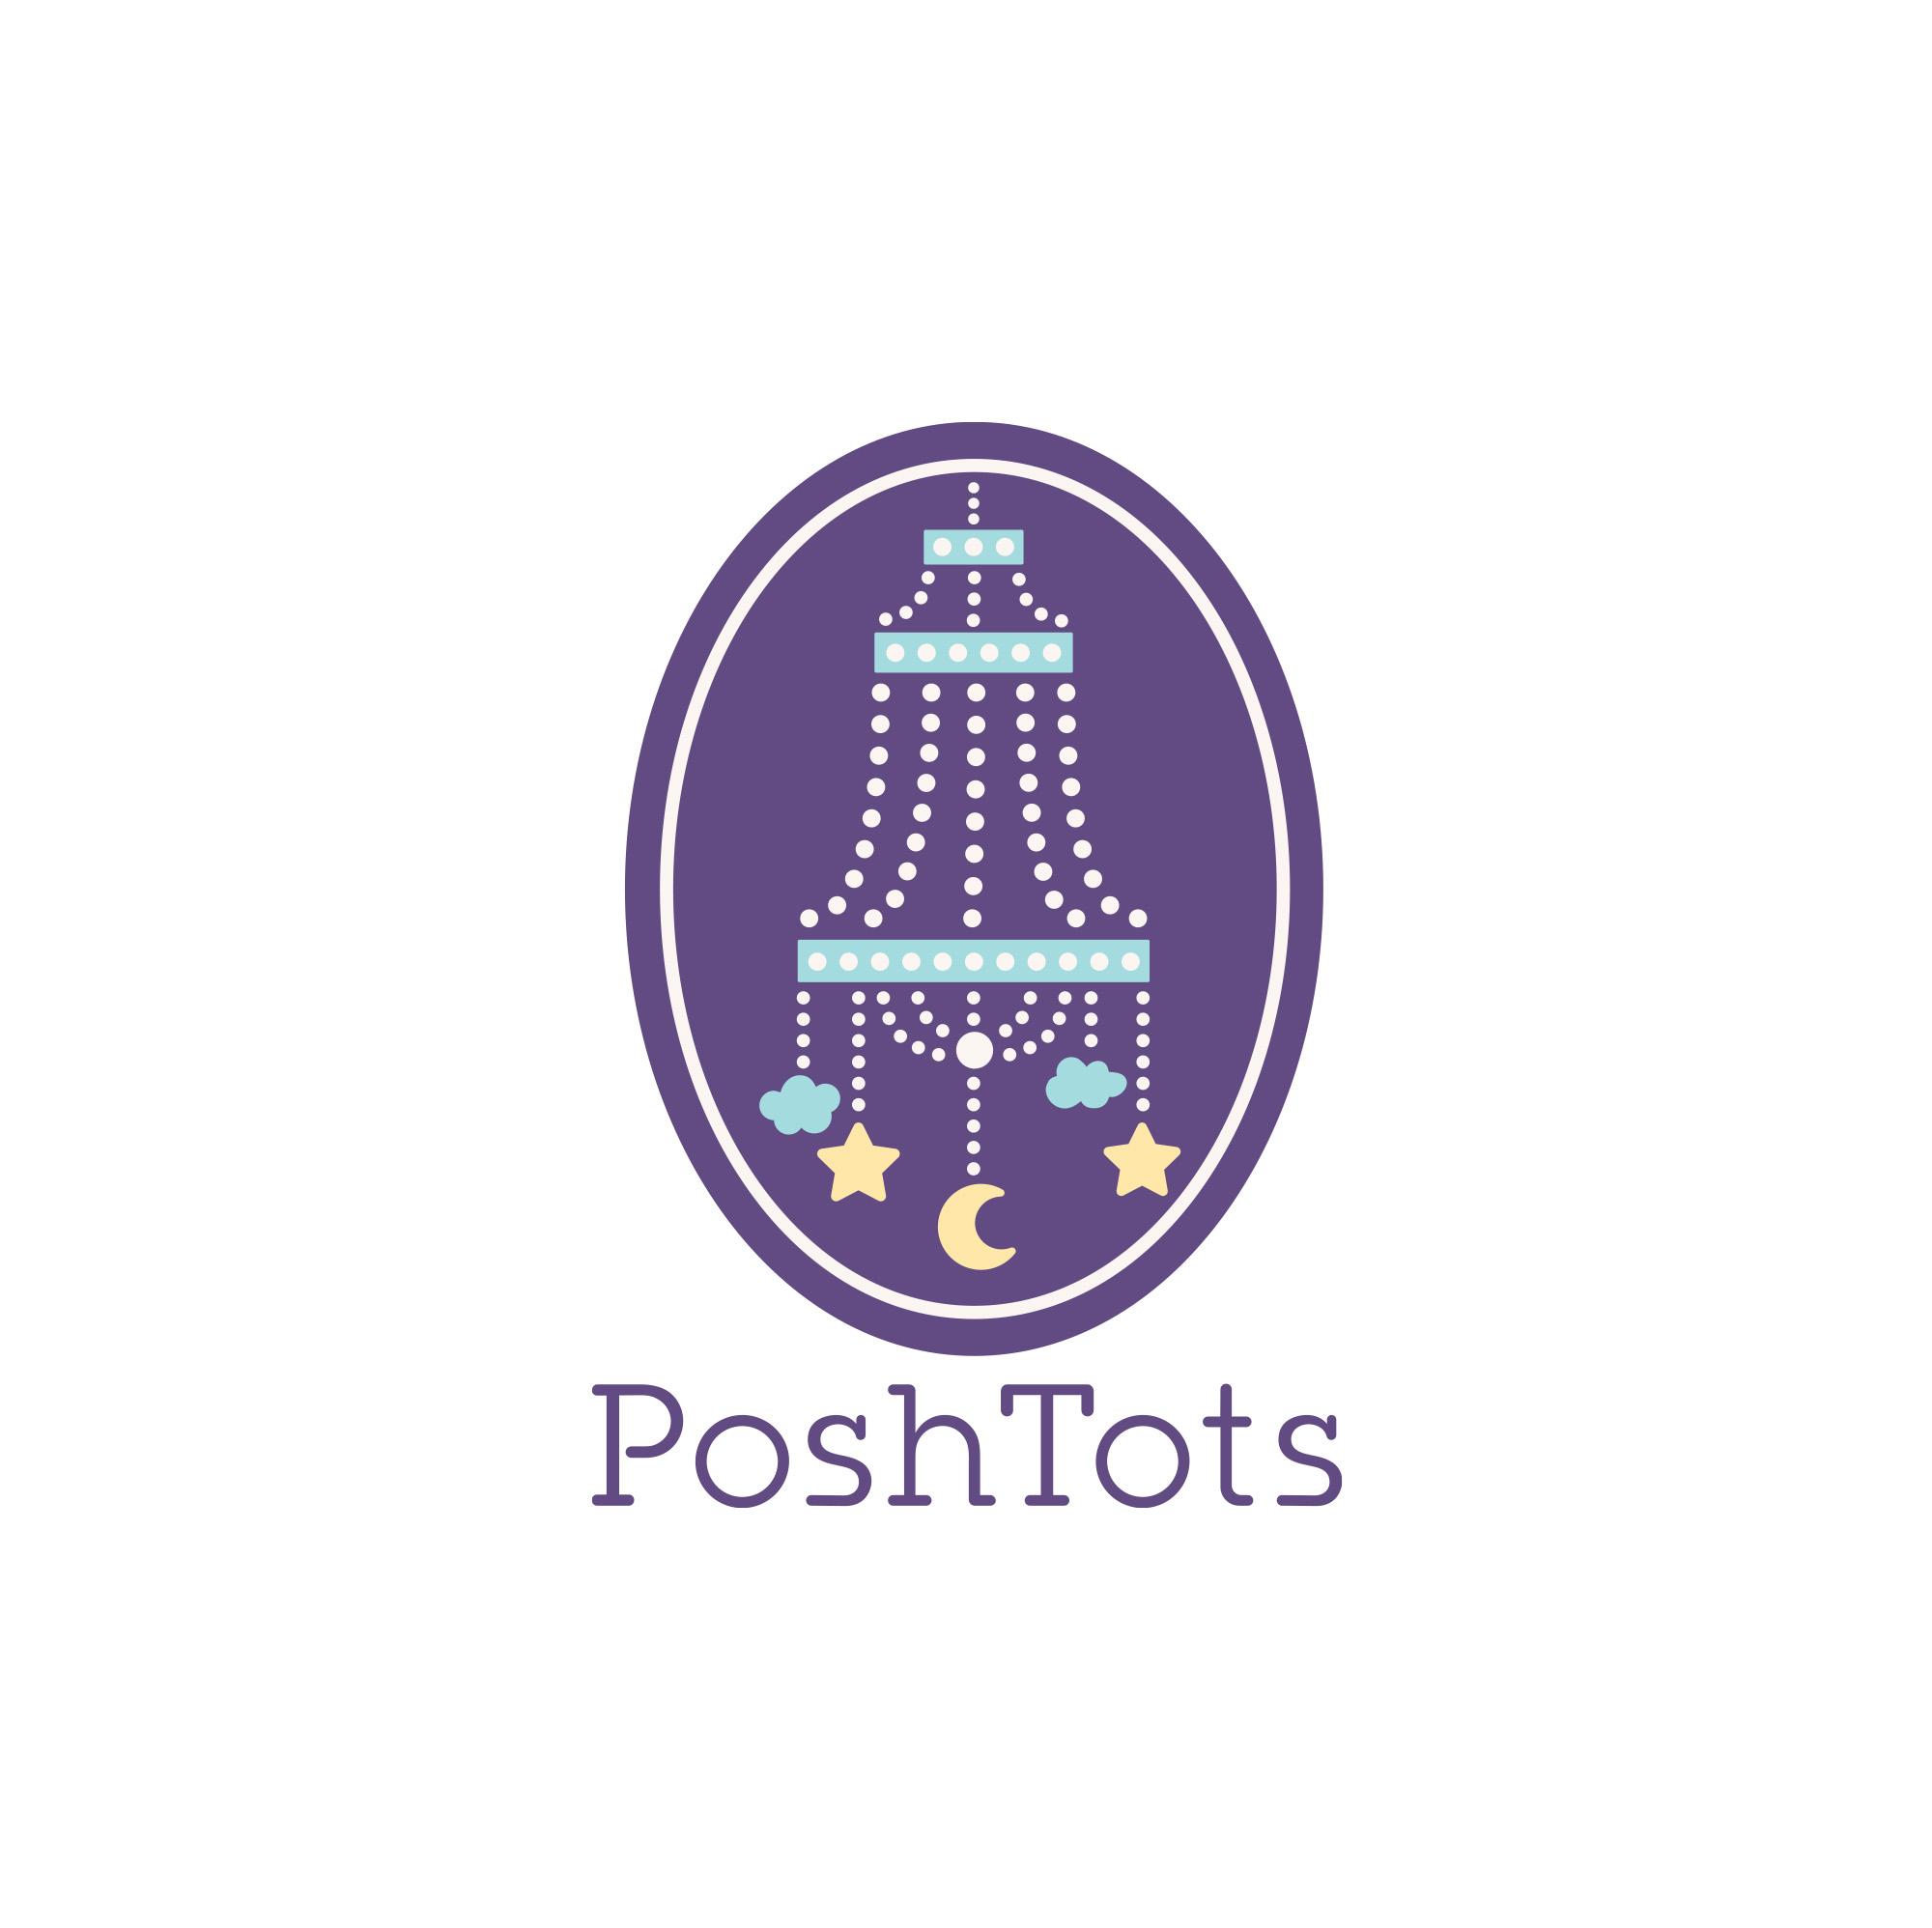 logos_0000_poshtots